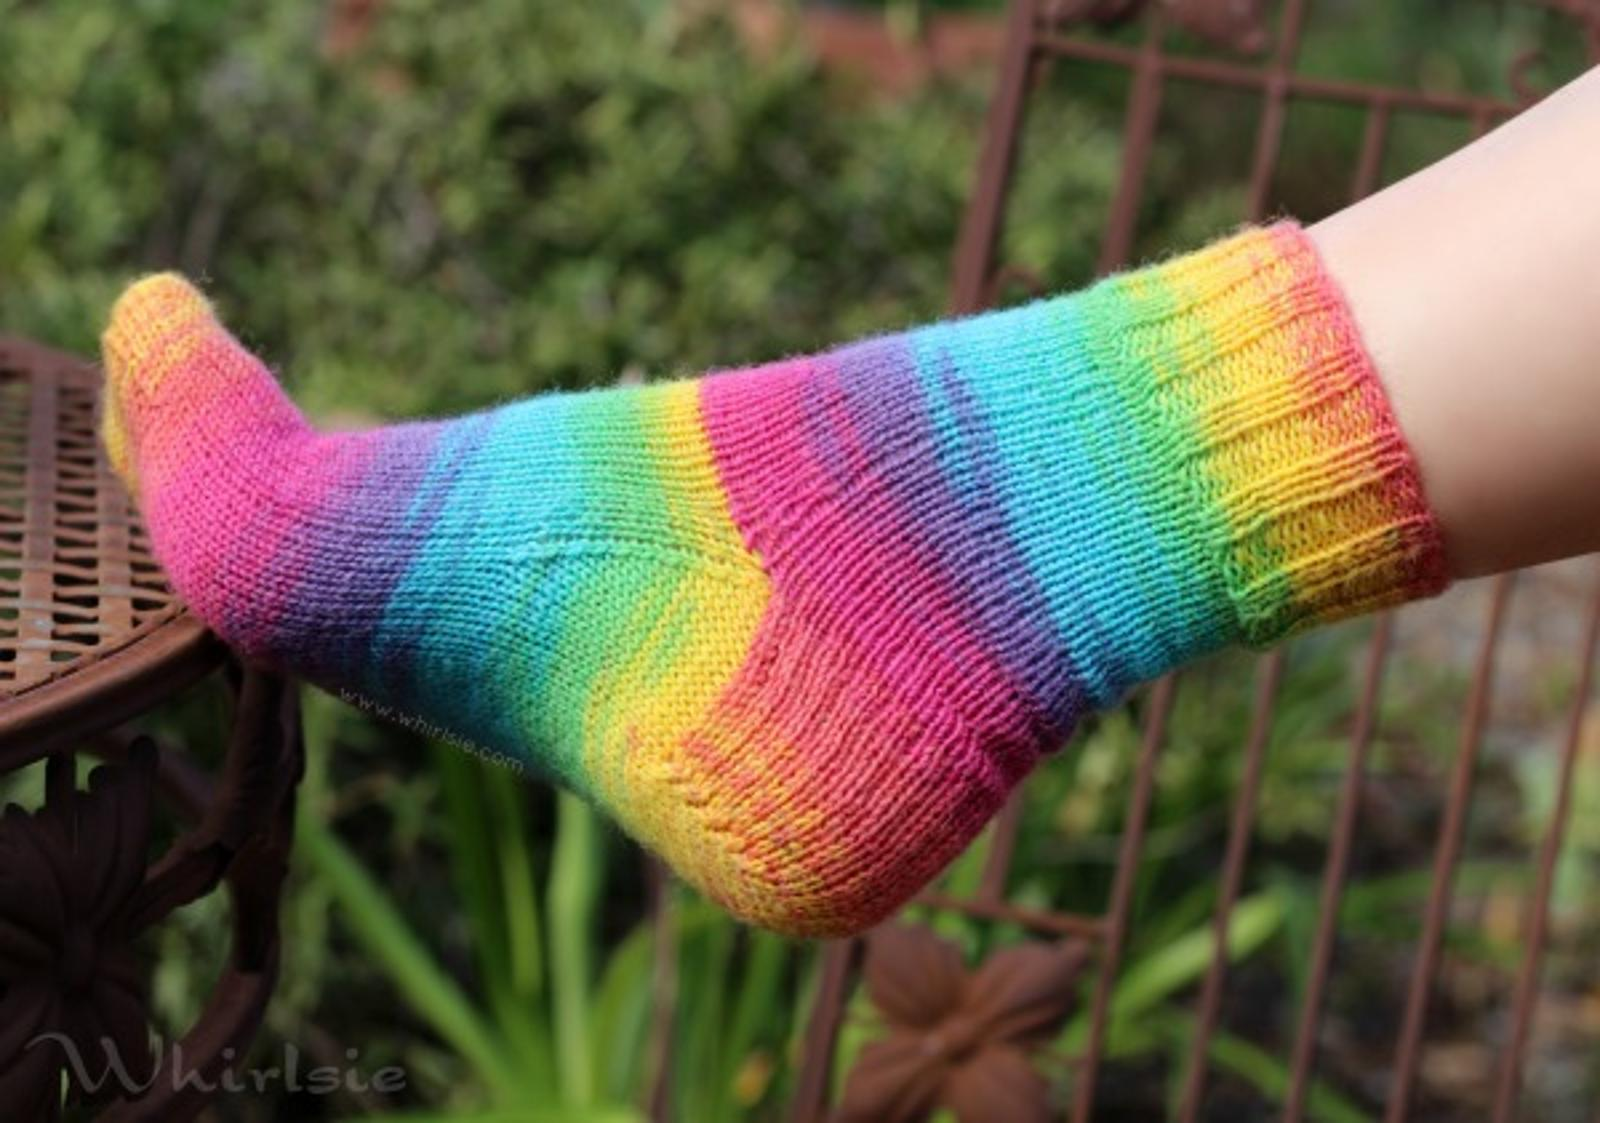 Whirlsie's Vanilla Socks Knitting Pattern